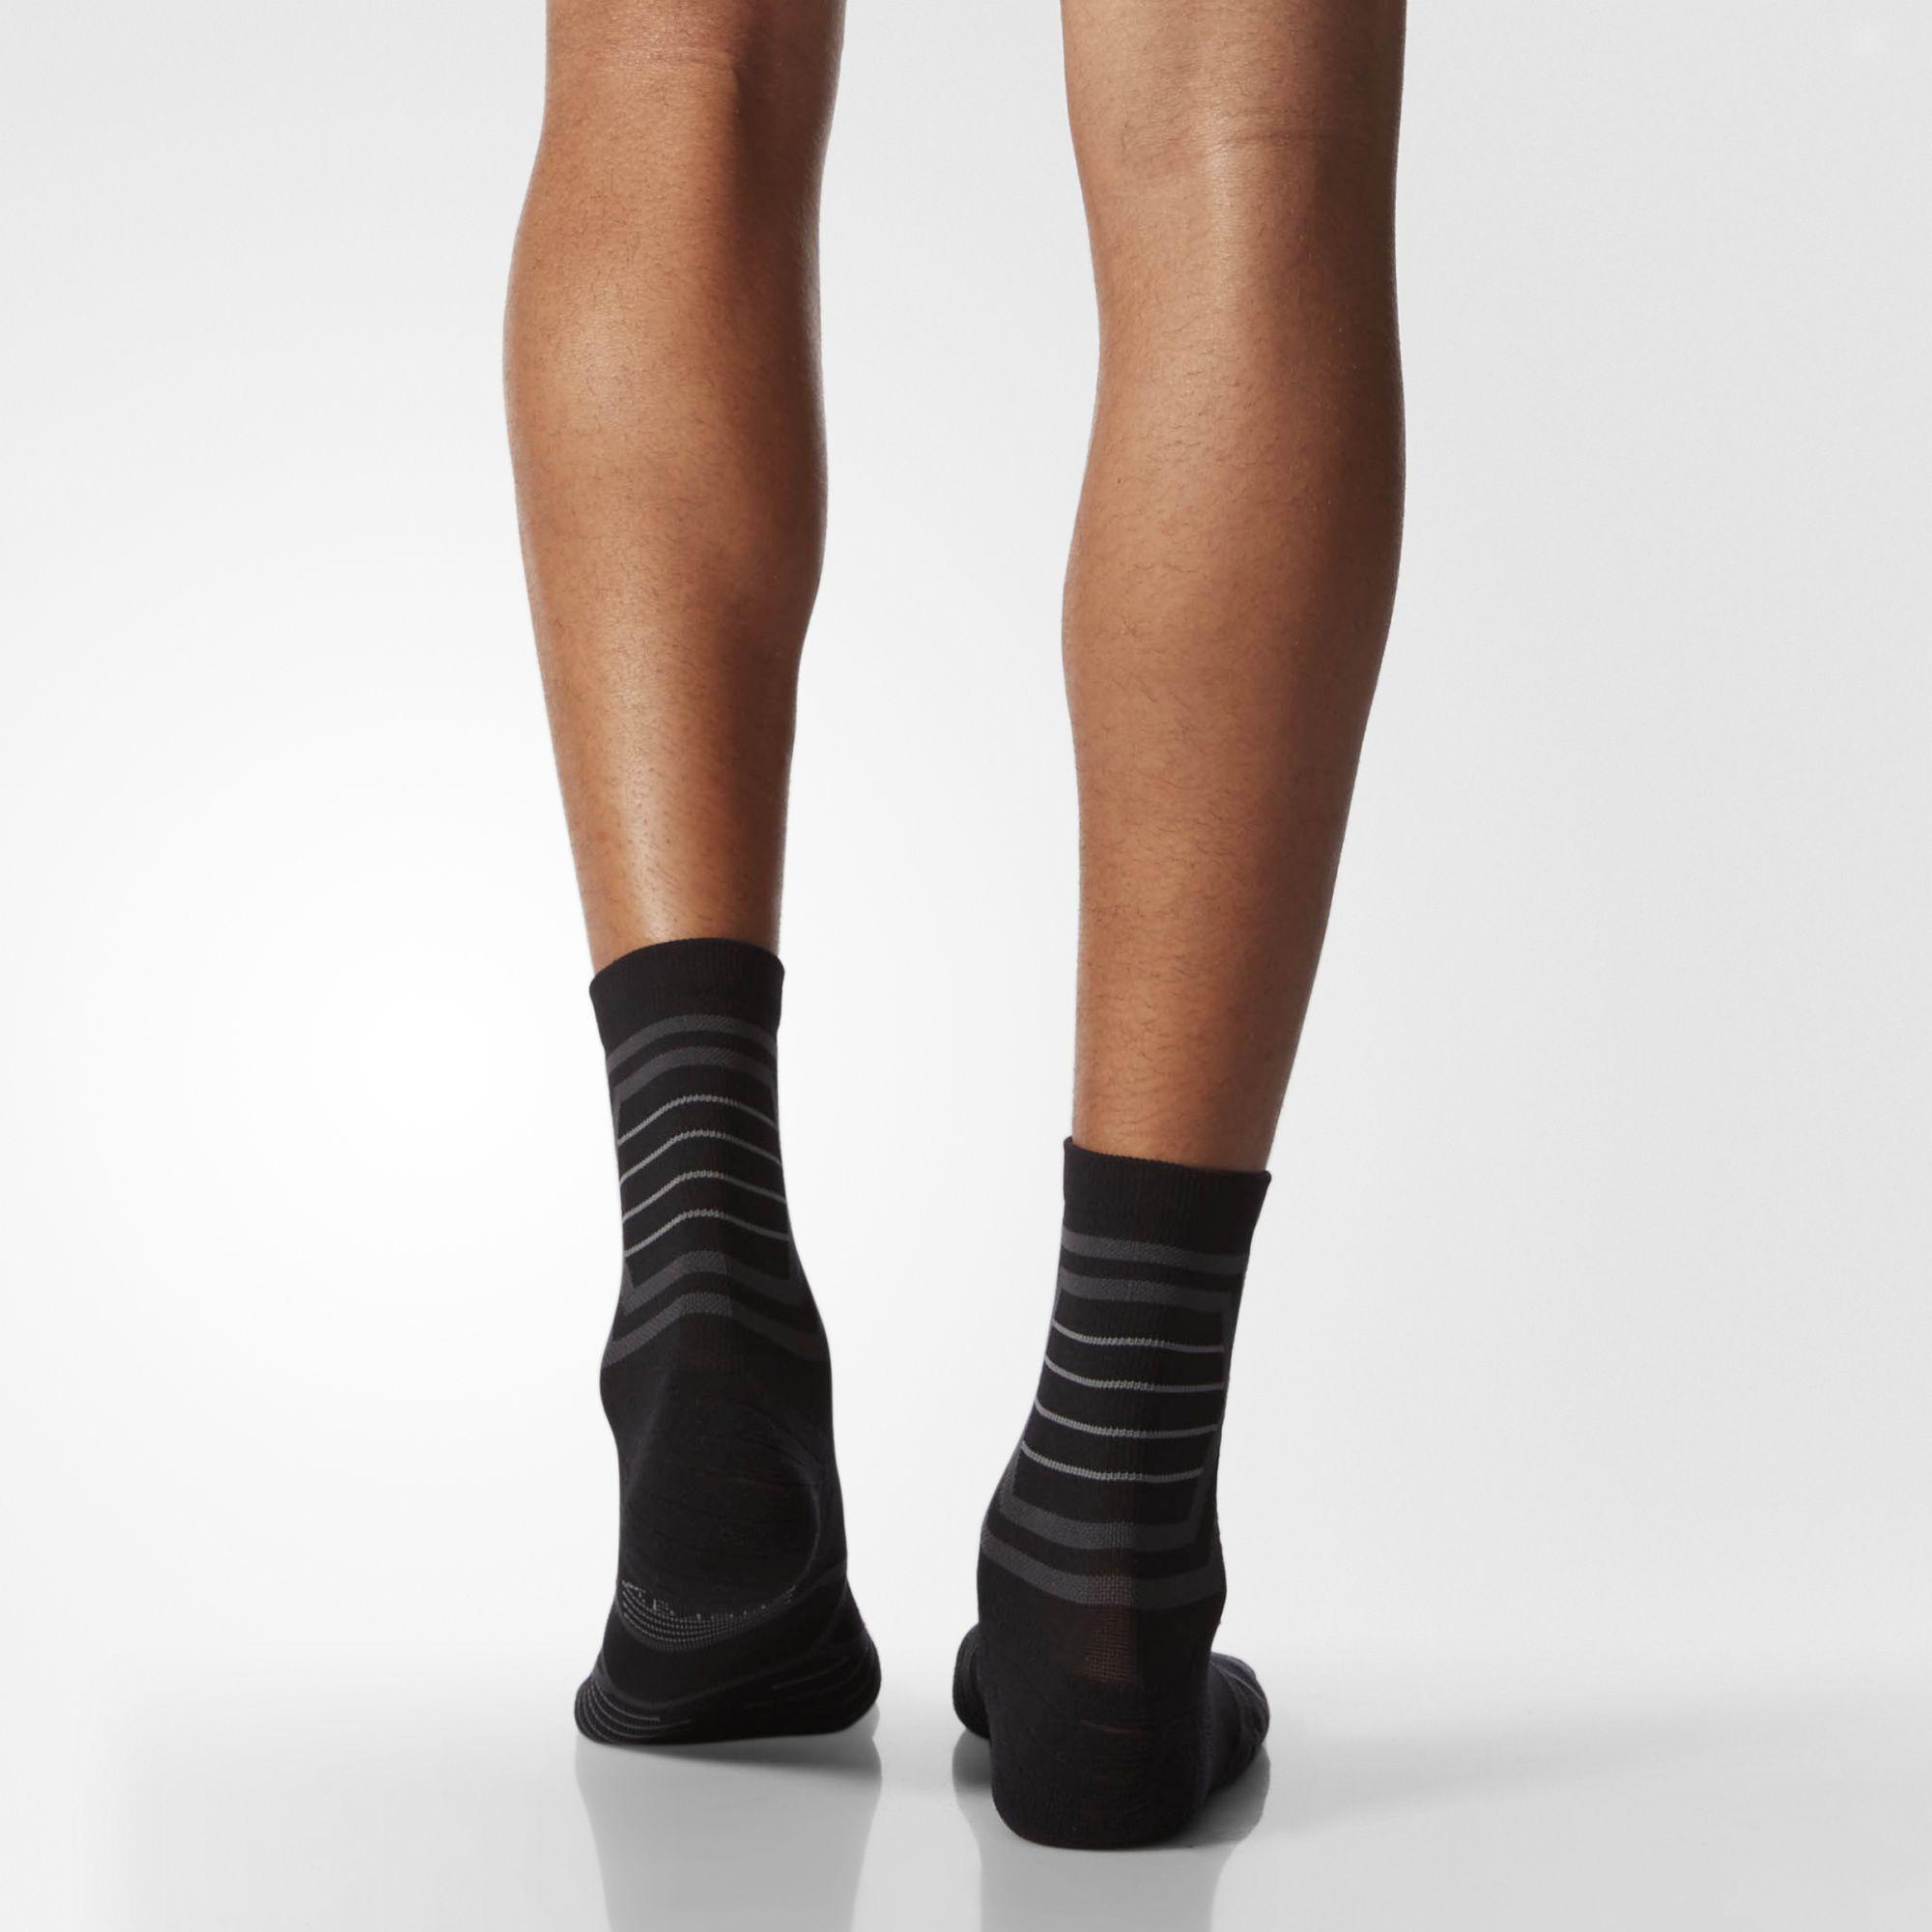 19ae4bb54 Lyst - Adidas Energy Running Mid Crew Socks L 1 Pair in Black for Men